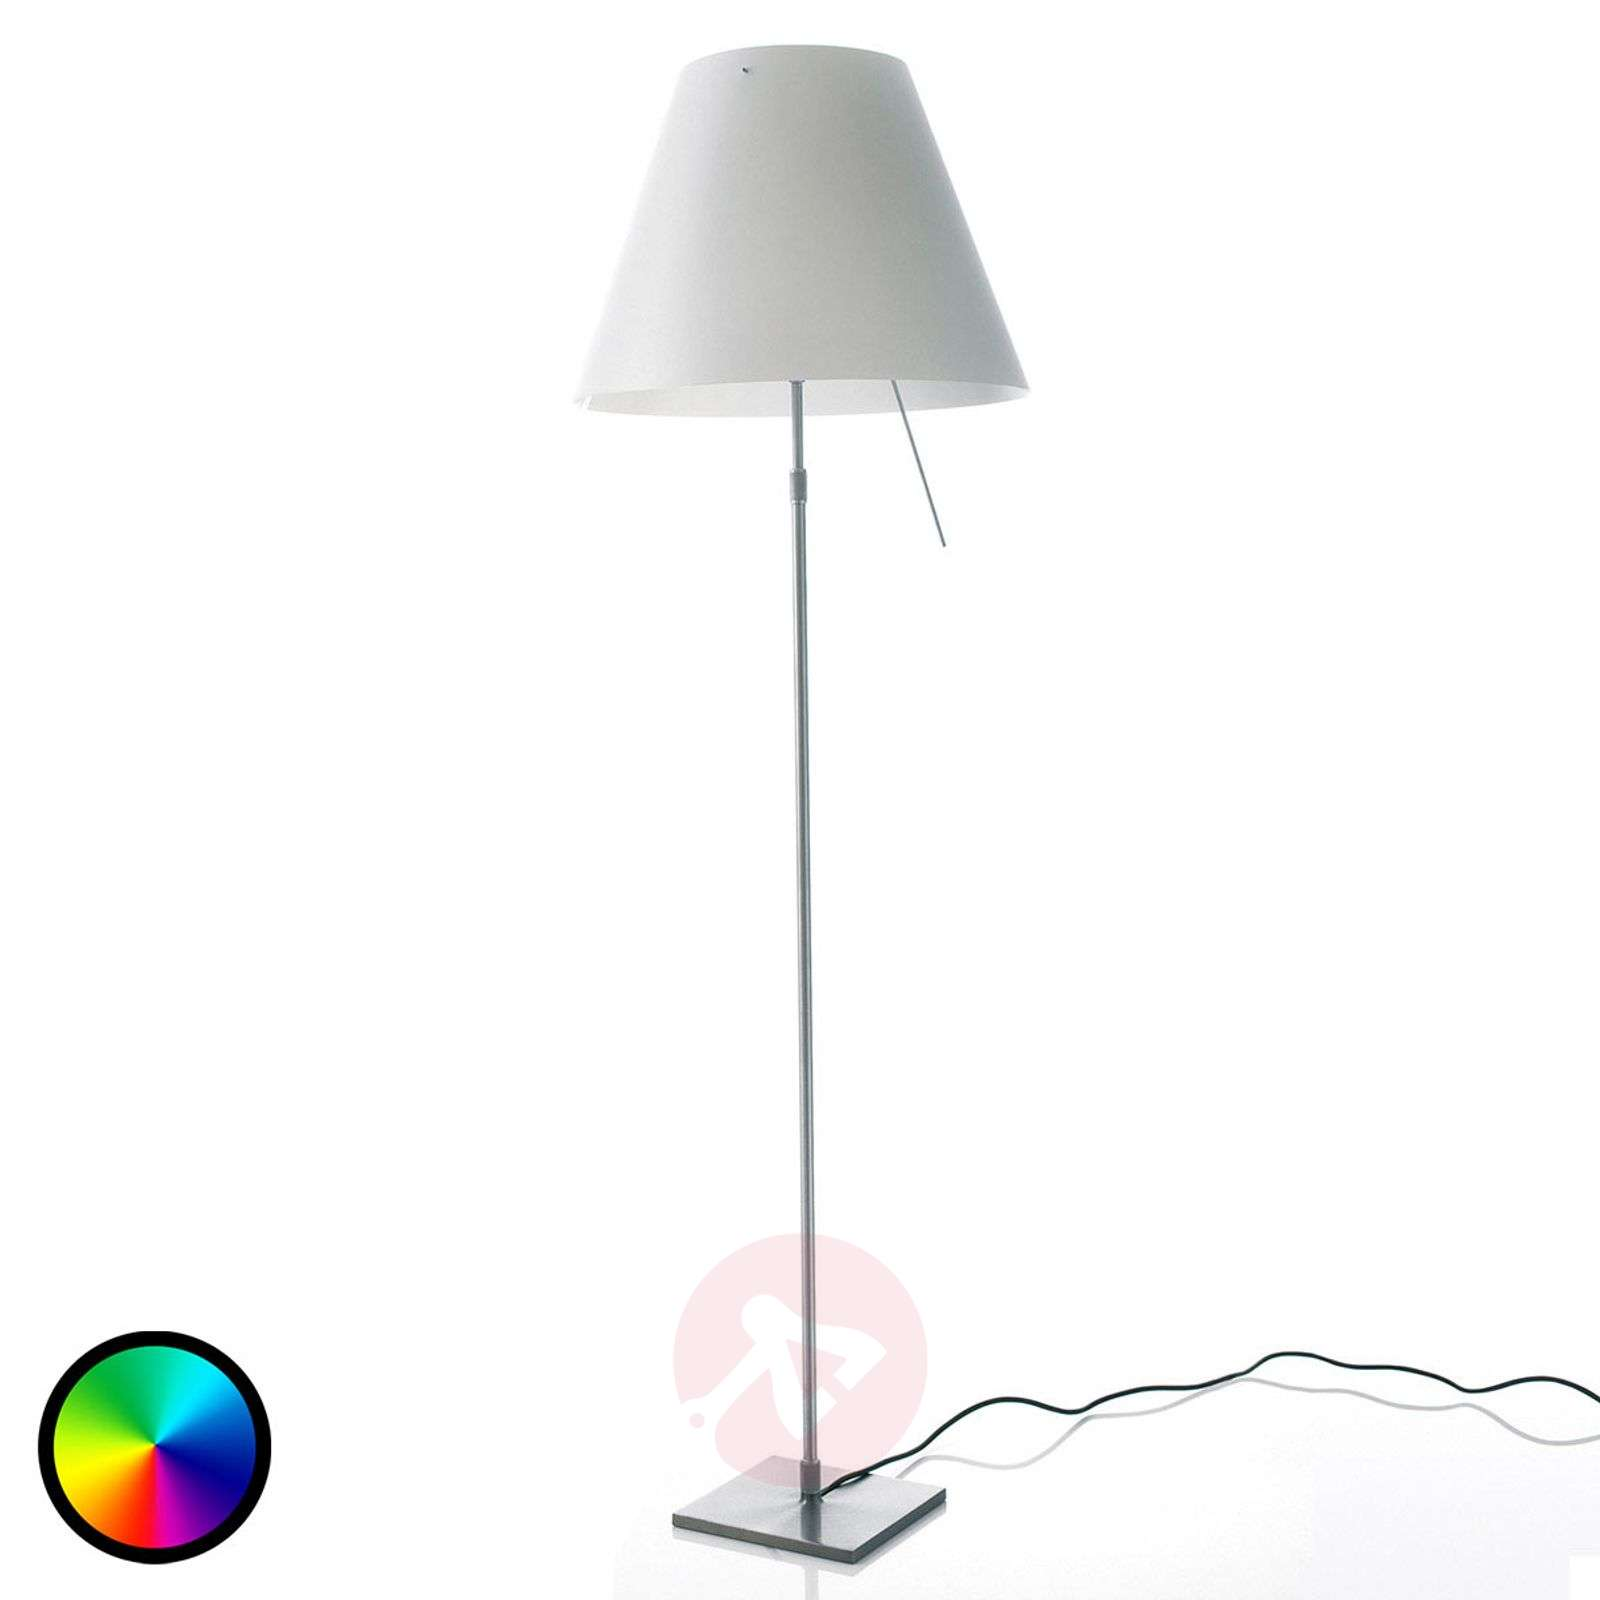 Philips hue led floor lamp constanza adjustable lights luceplan costanza floor lamp with philips hue bulb 6030167 01 aloadofball Gallery